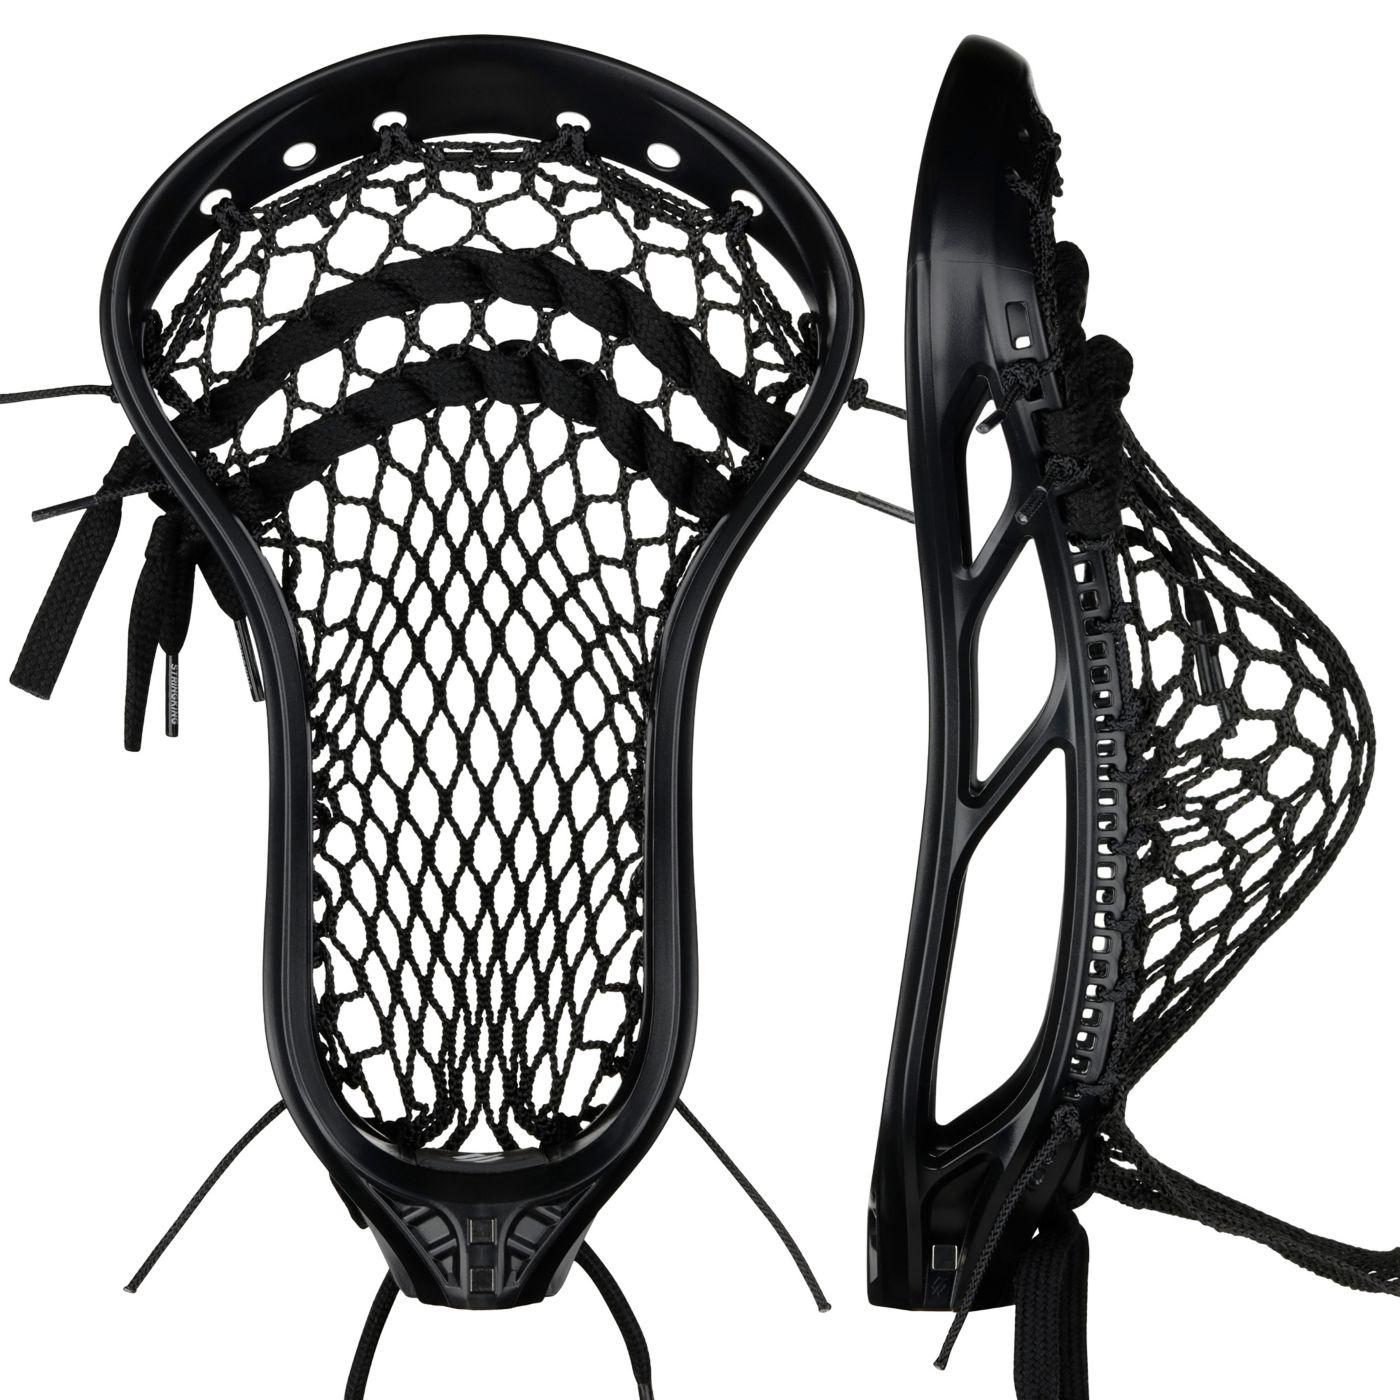 StringKing Men's Mark Stiff 2F M4F Strung Lacrosse Head